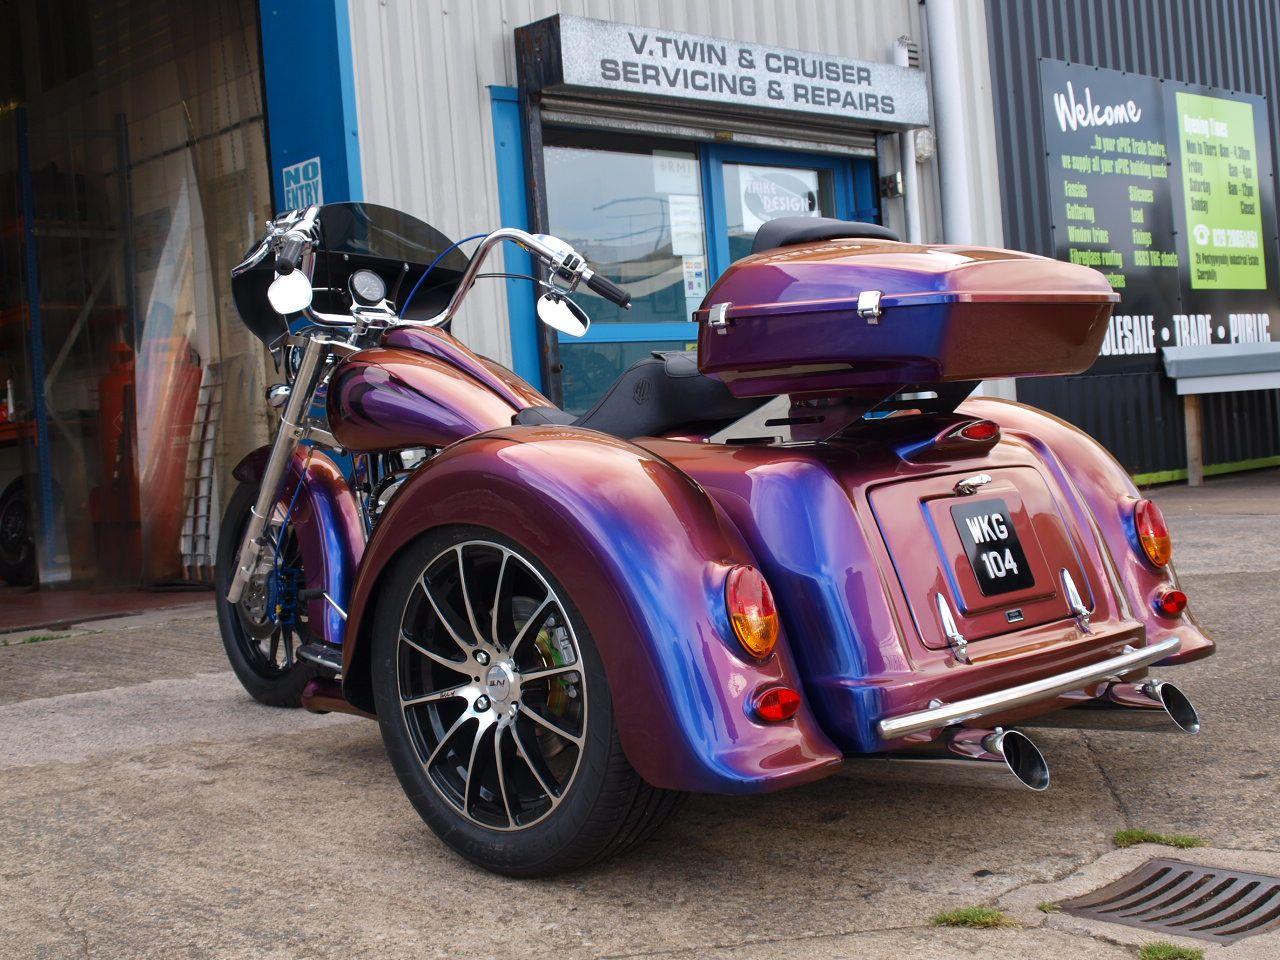 Chameleon trike Trike, Motorcycle design, Car and